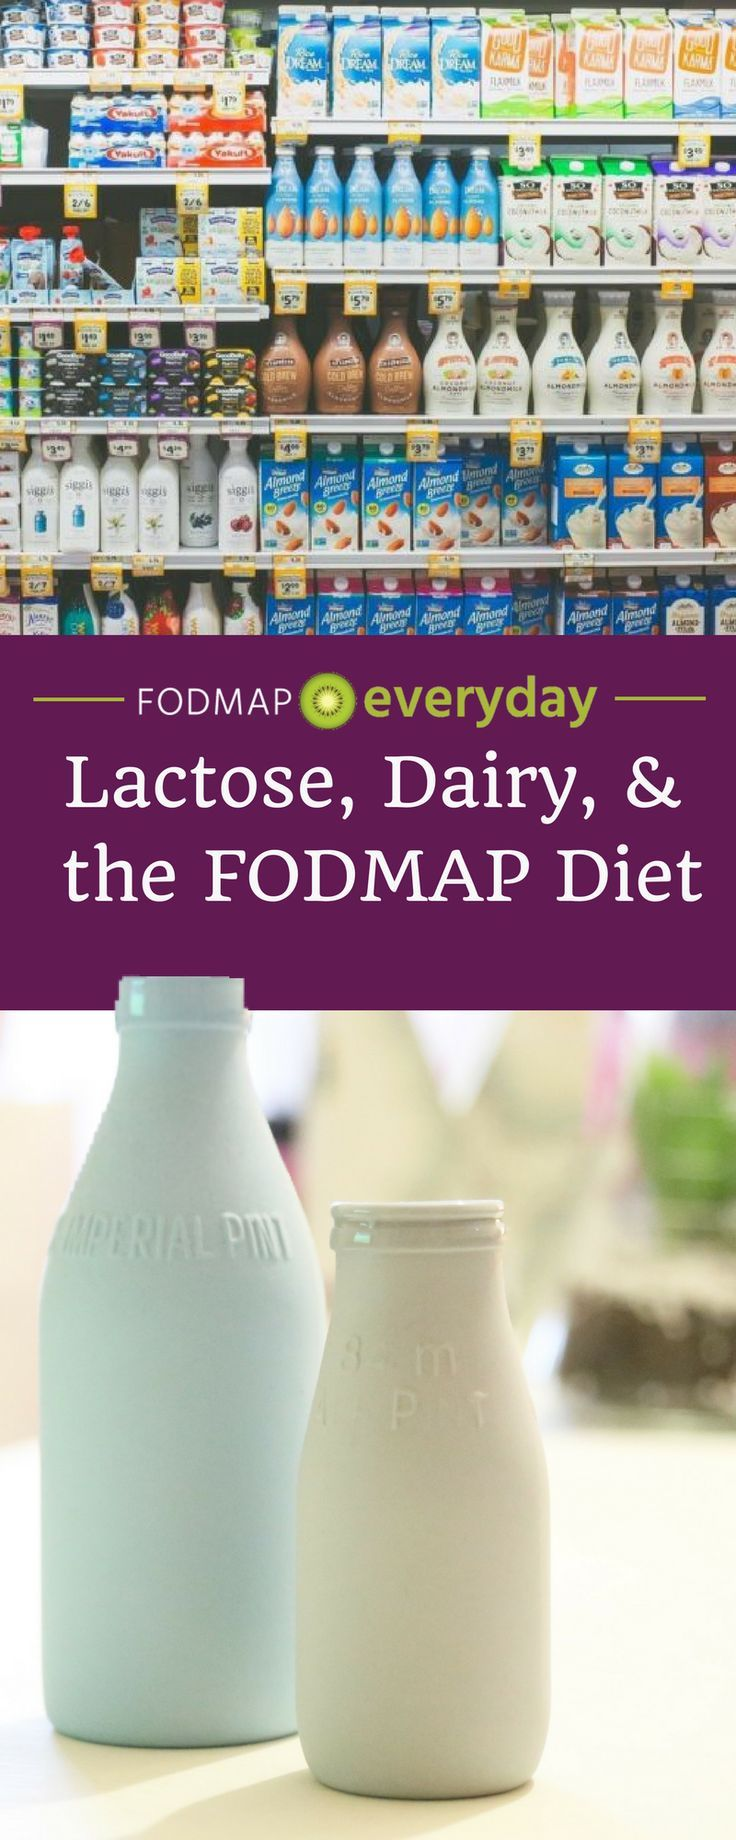 Lactose dairy the low fodmap diet fodmap fodmap diet